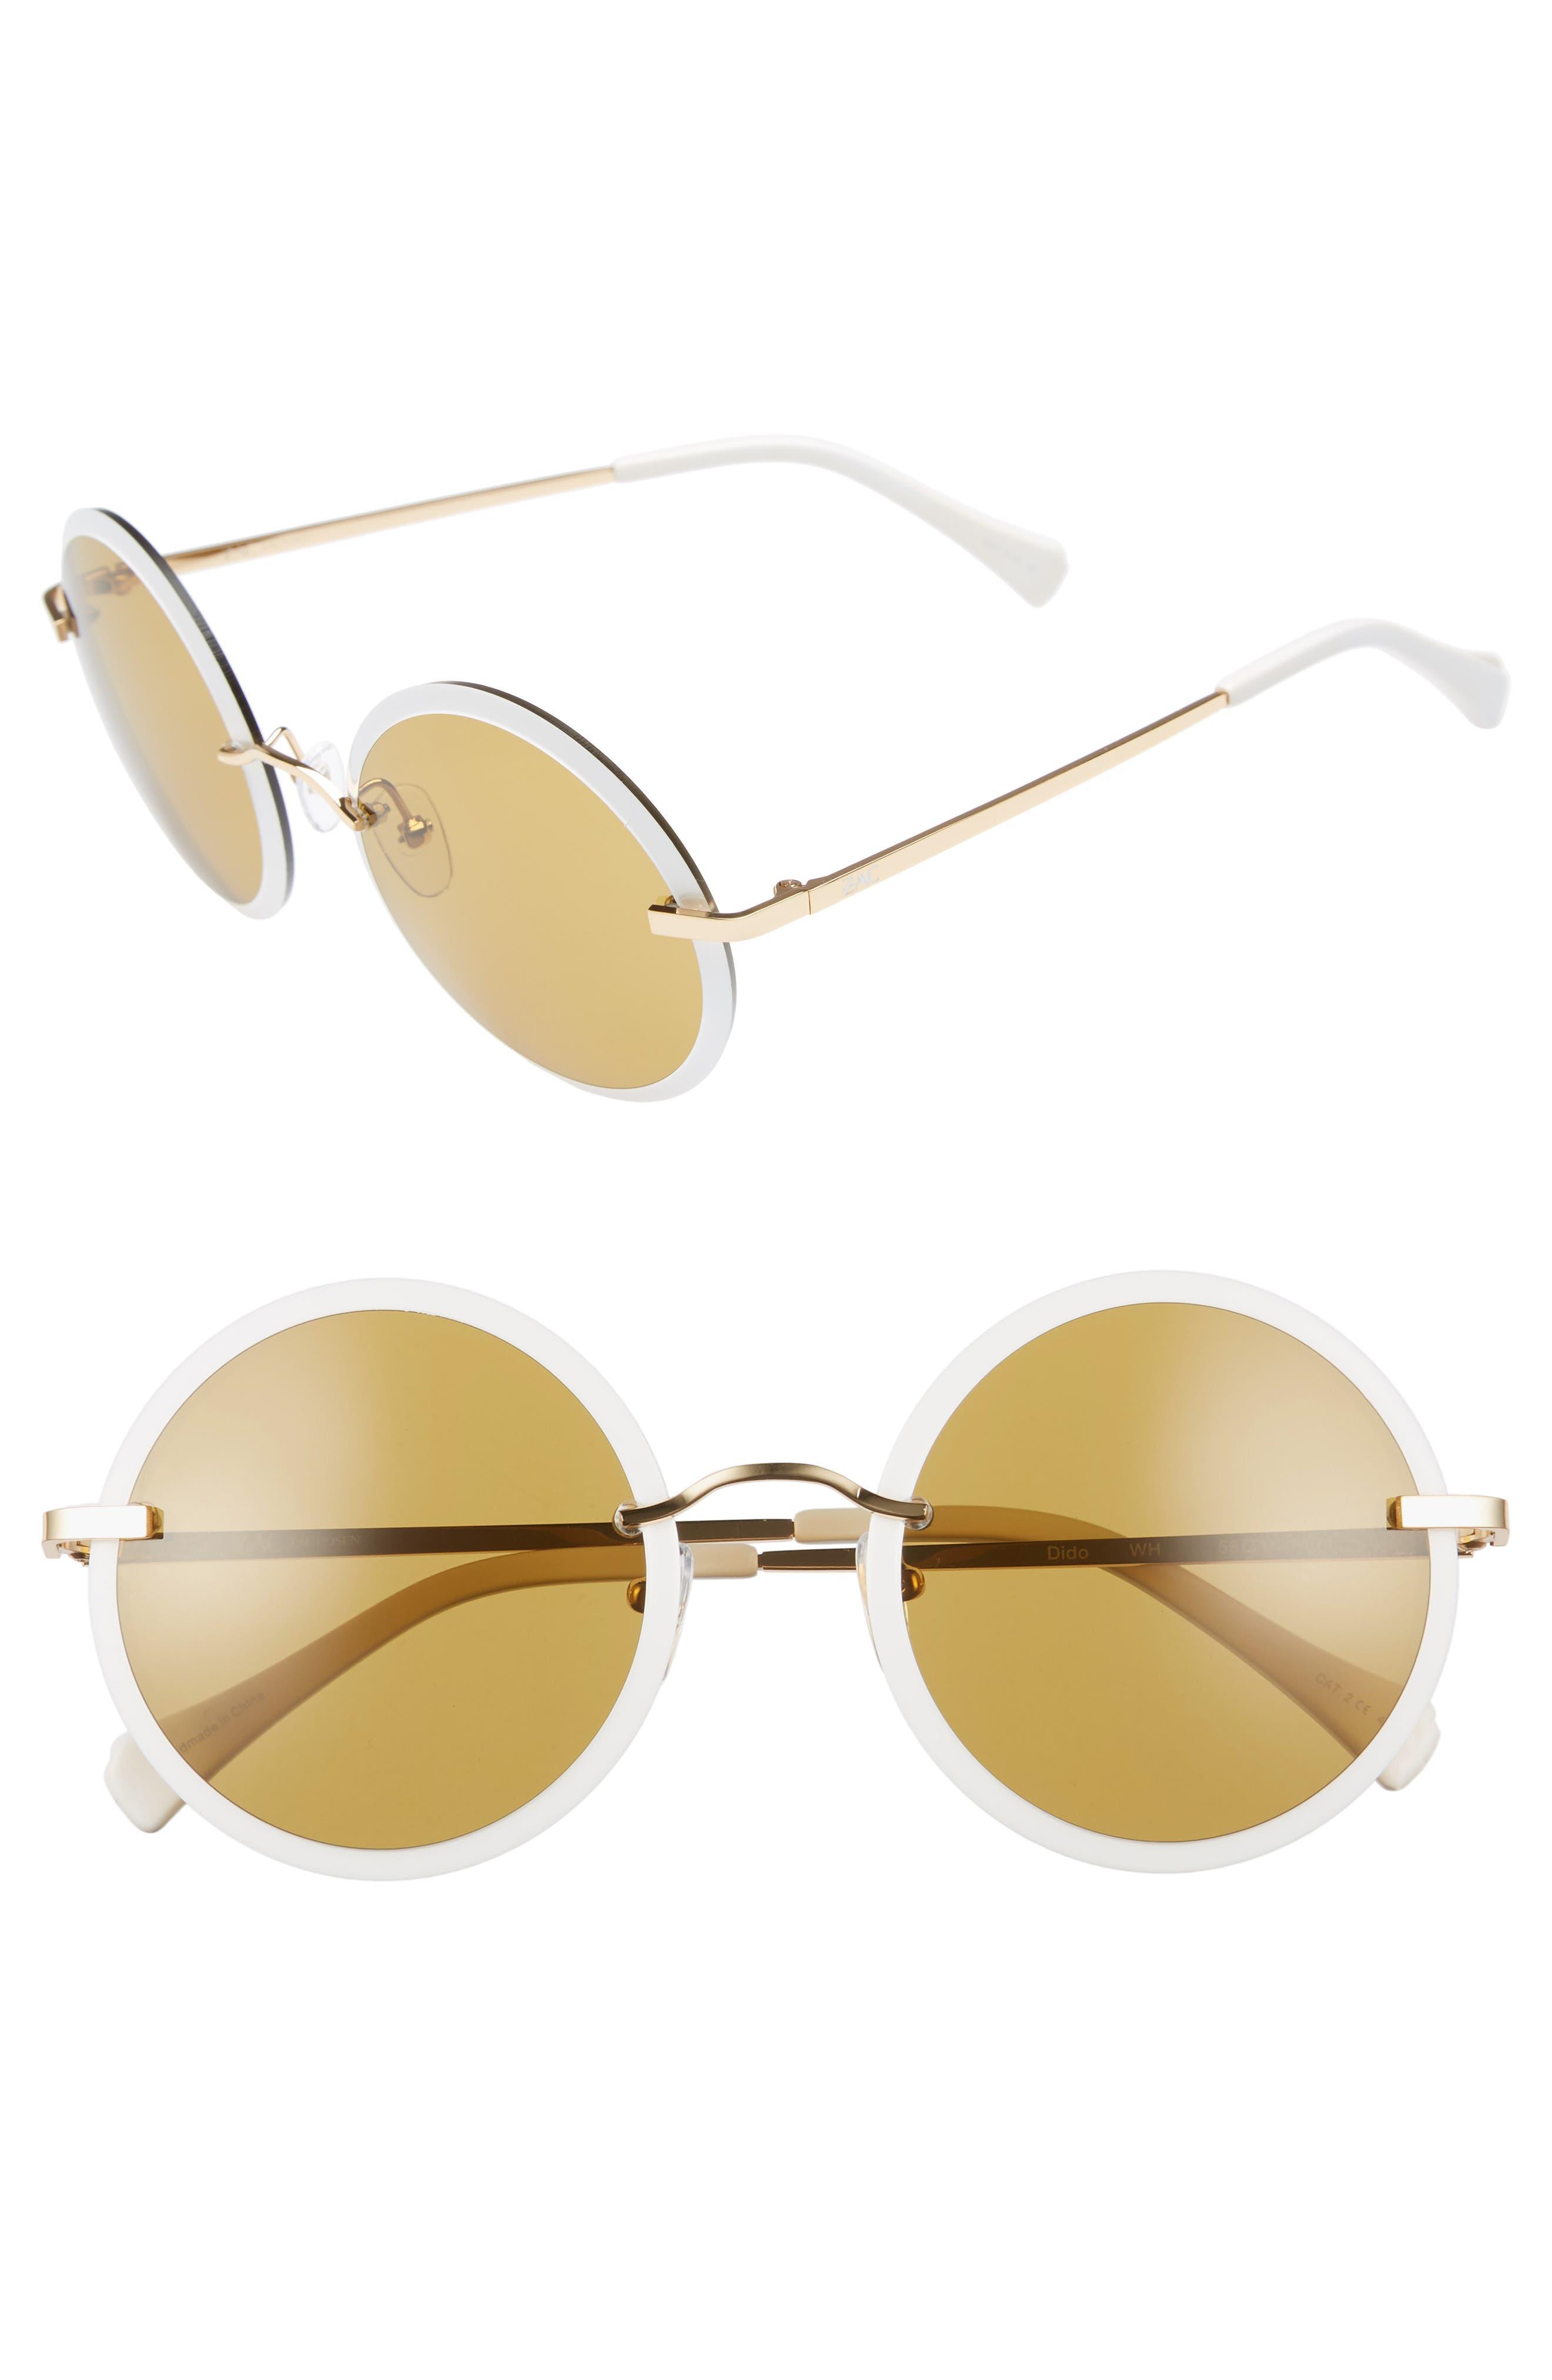 Dido 58mm Sunglasses,                         Main,                         color, White/ Gold